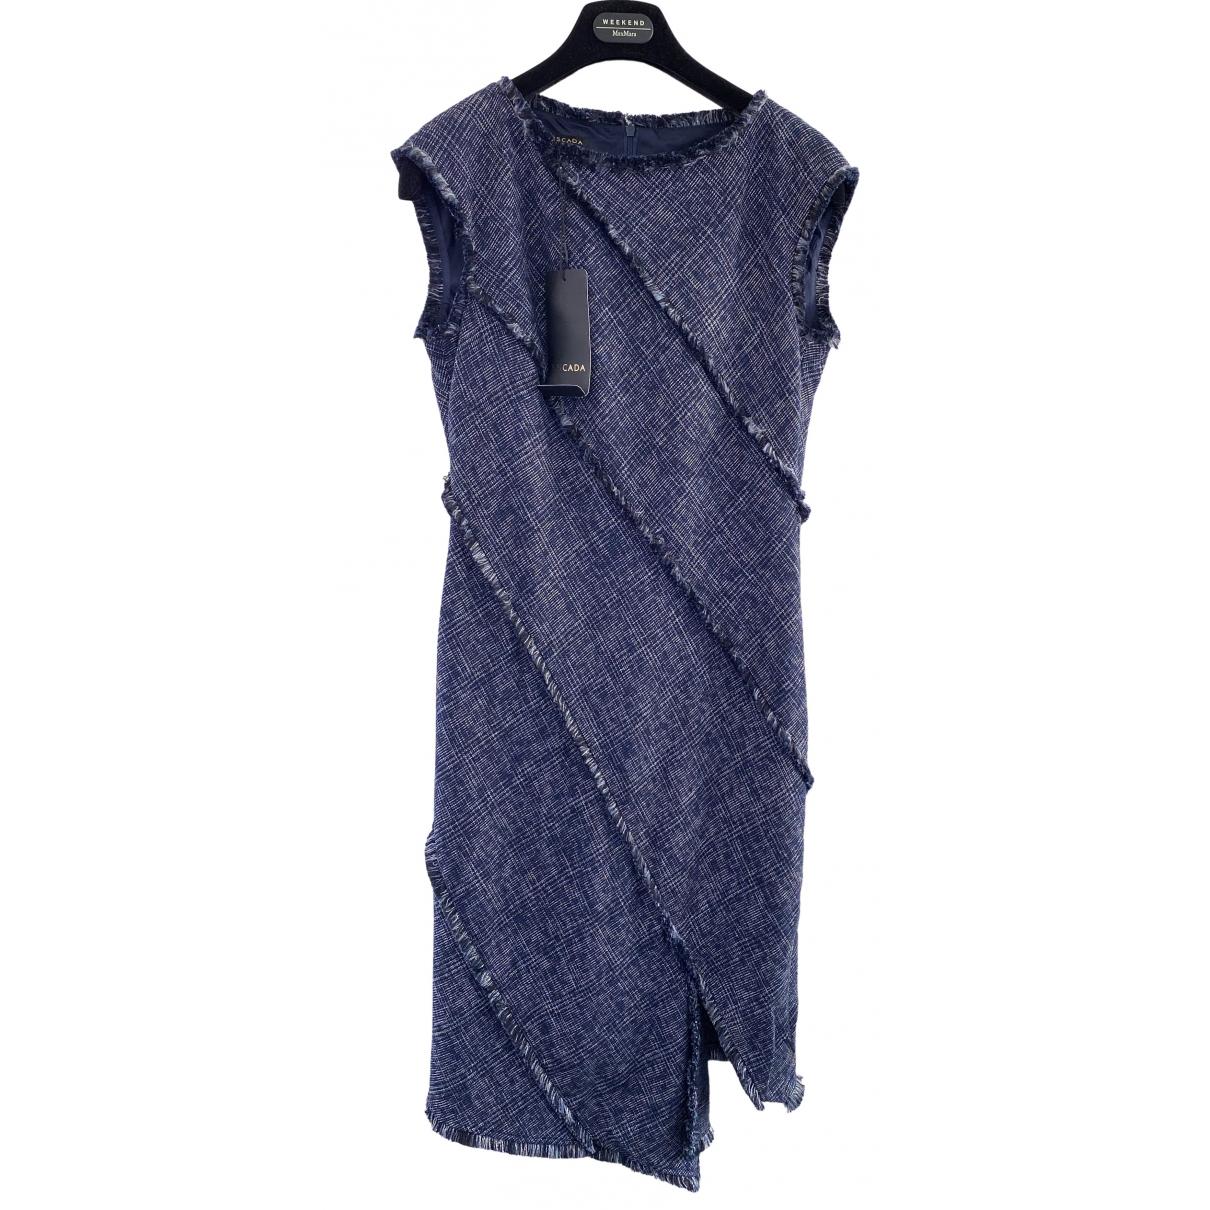 Escada \N Kleid in  Marine Baumwolle - Elasthan